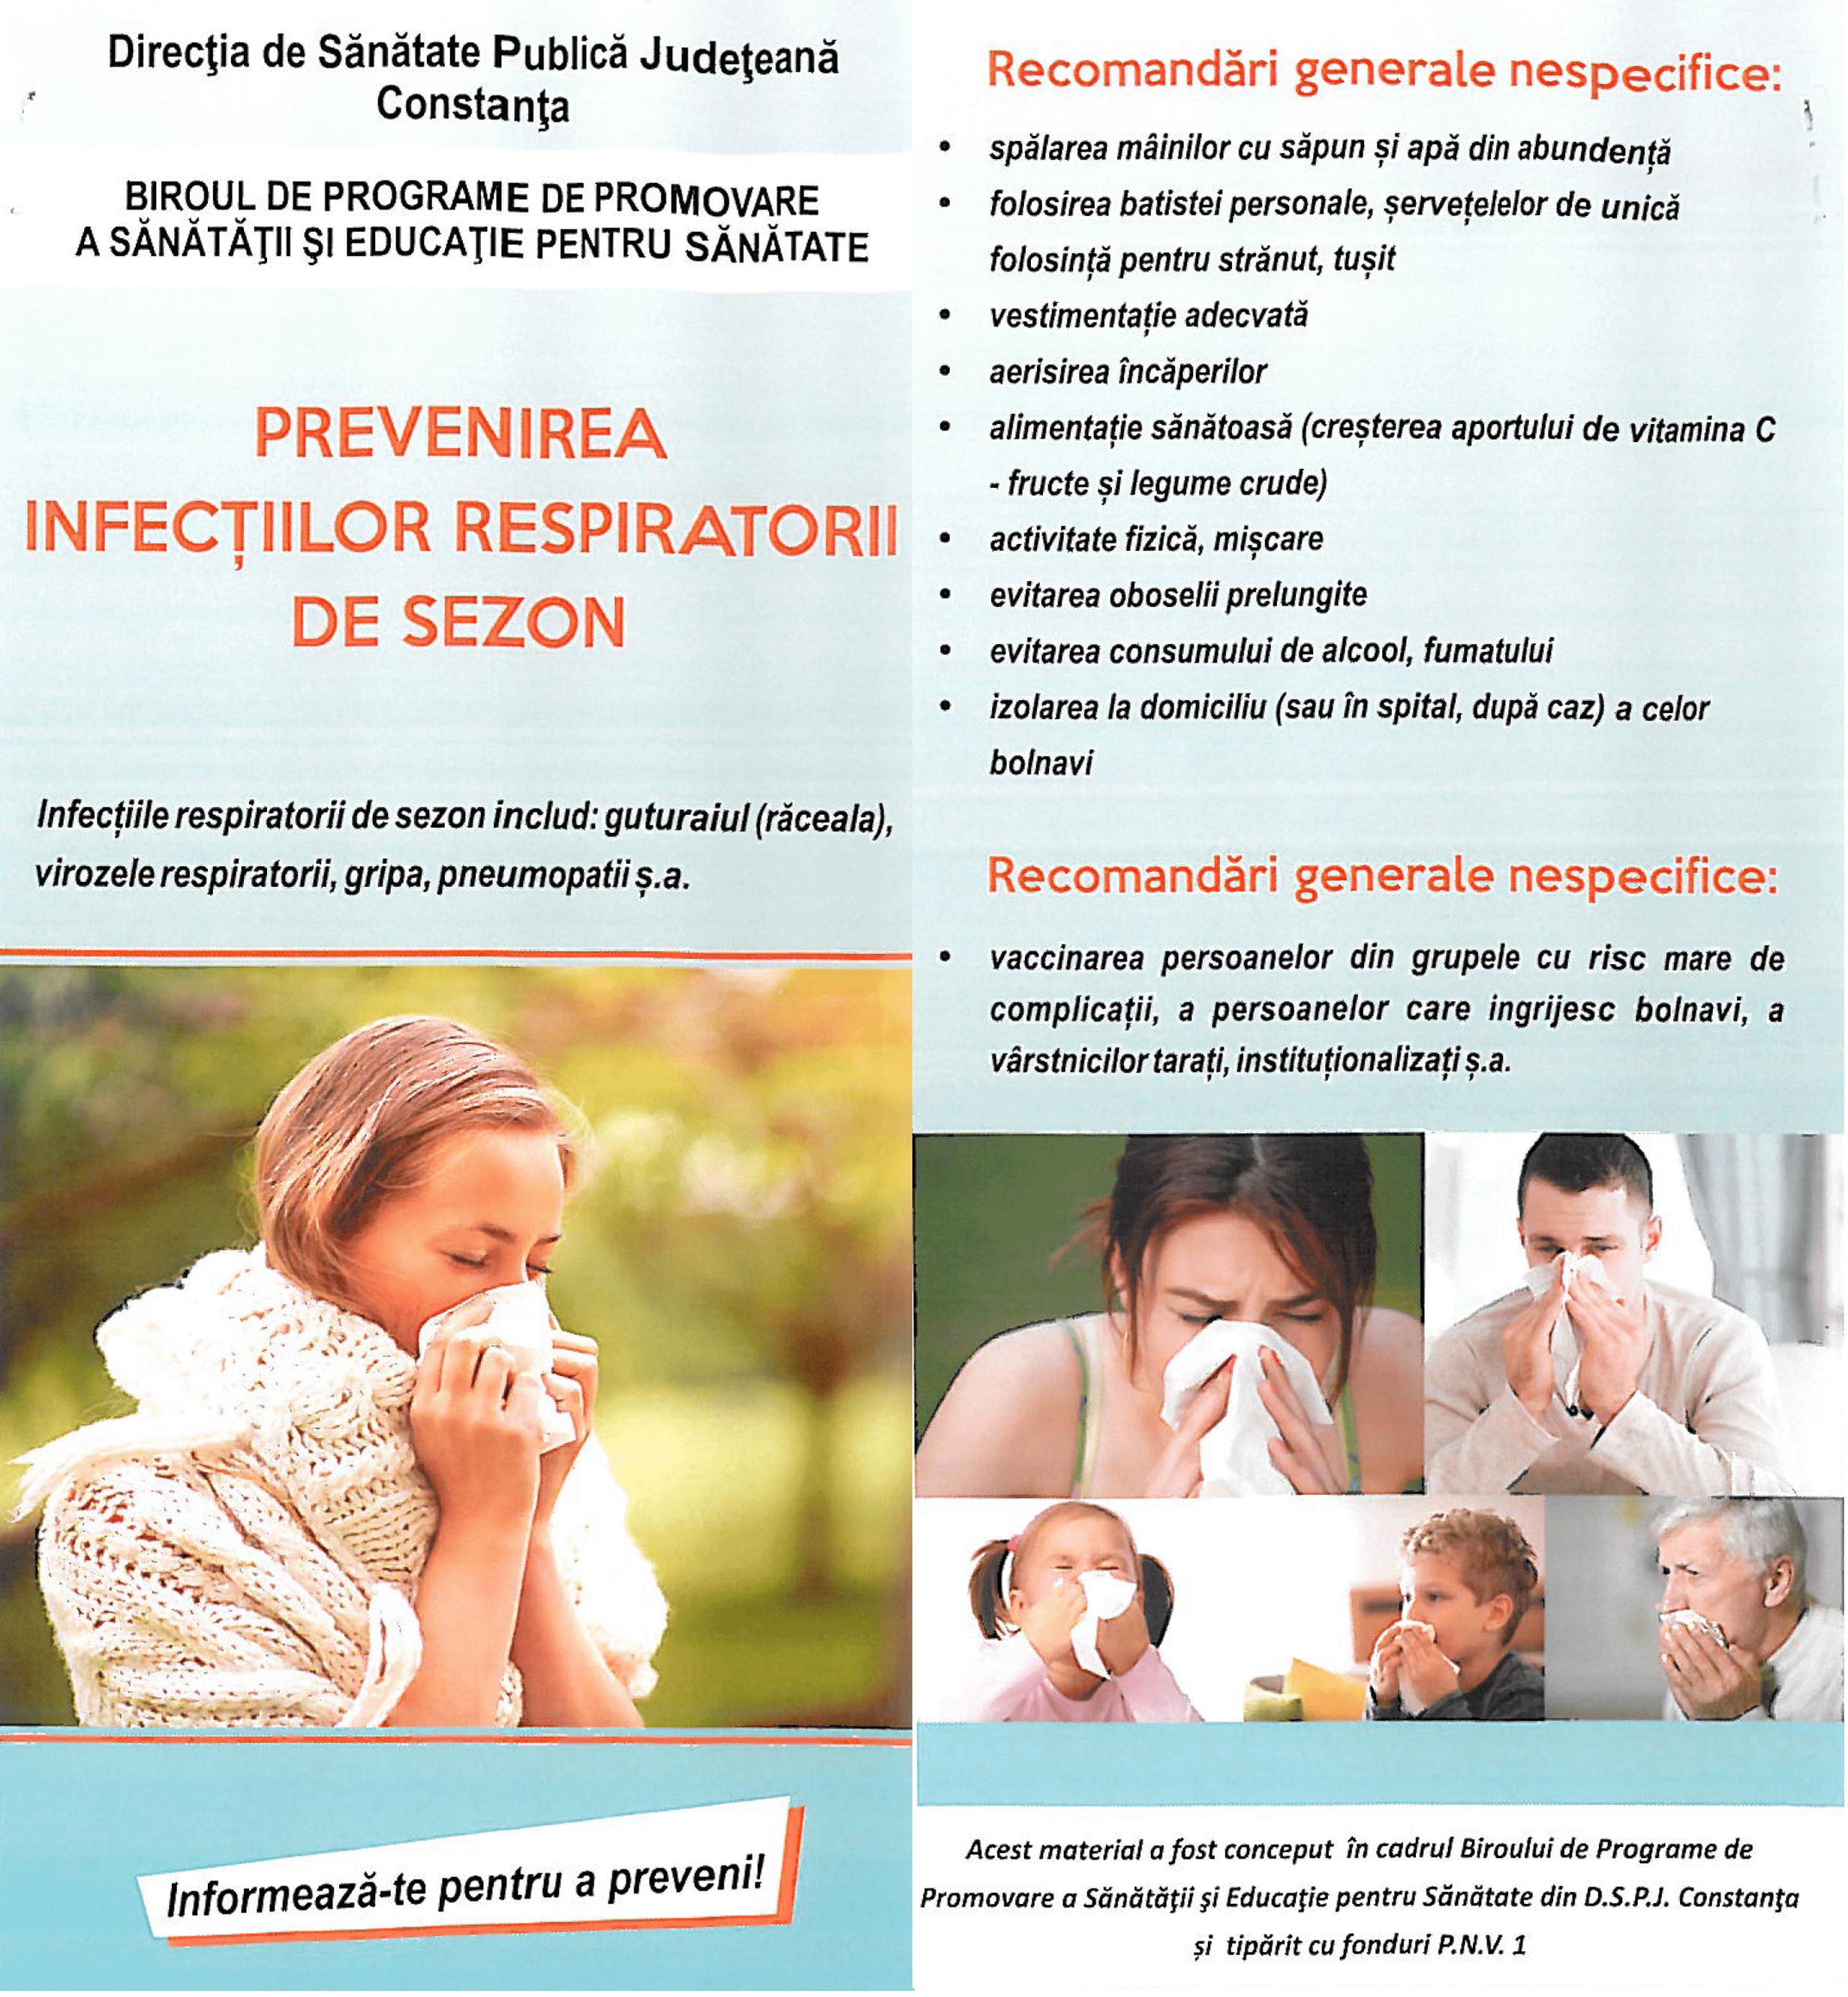 http://www.medstar2000.ro/wp-content/uploads/2018/01/Prevenirea-infectiilor-respiratorii-de-sezon.png